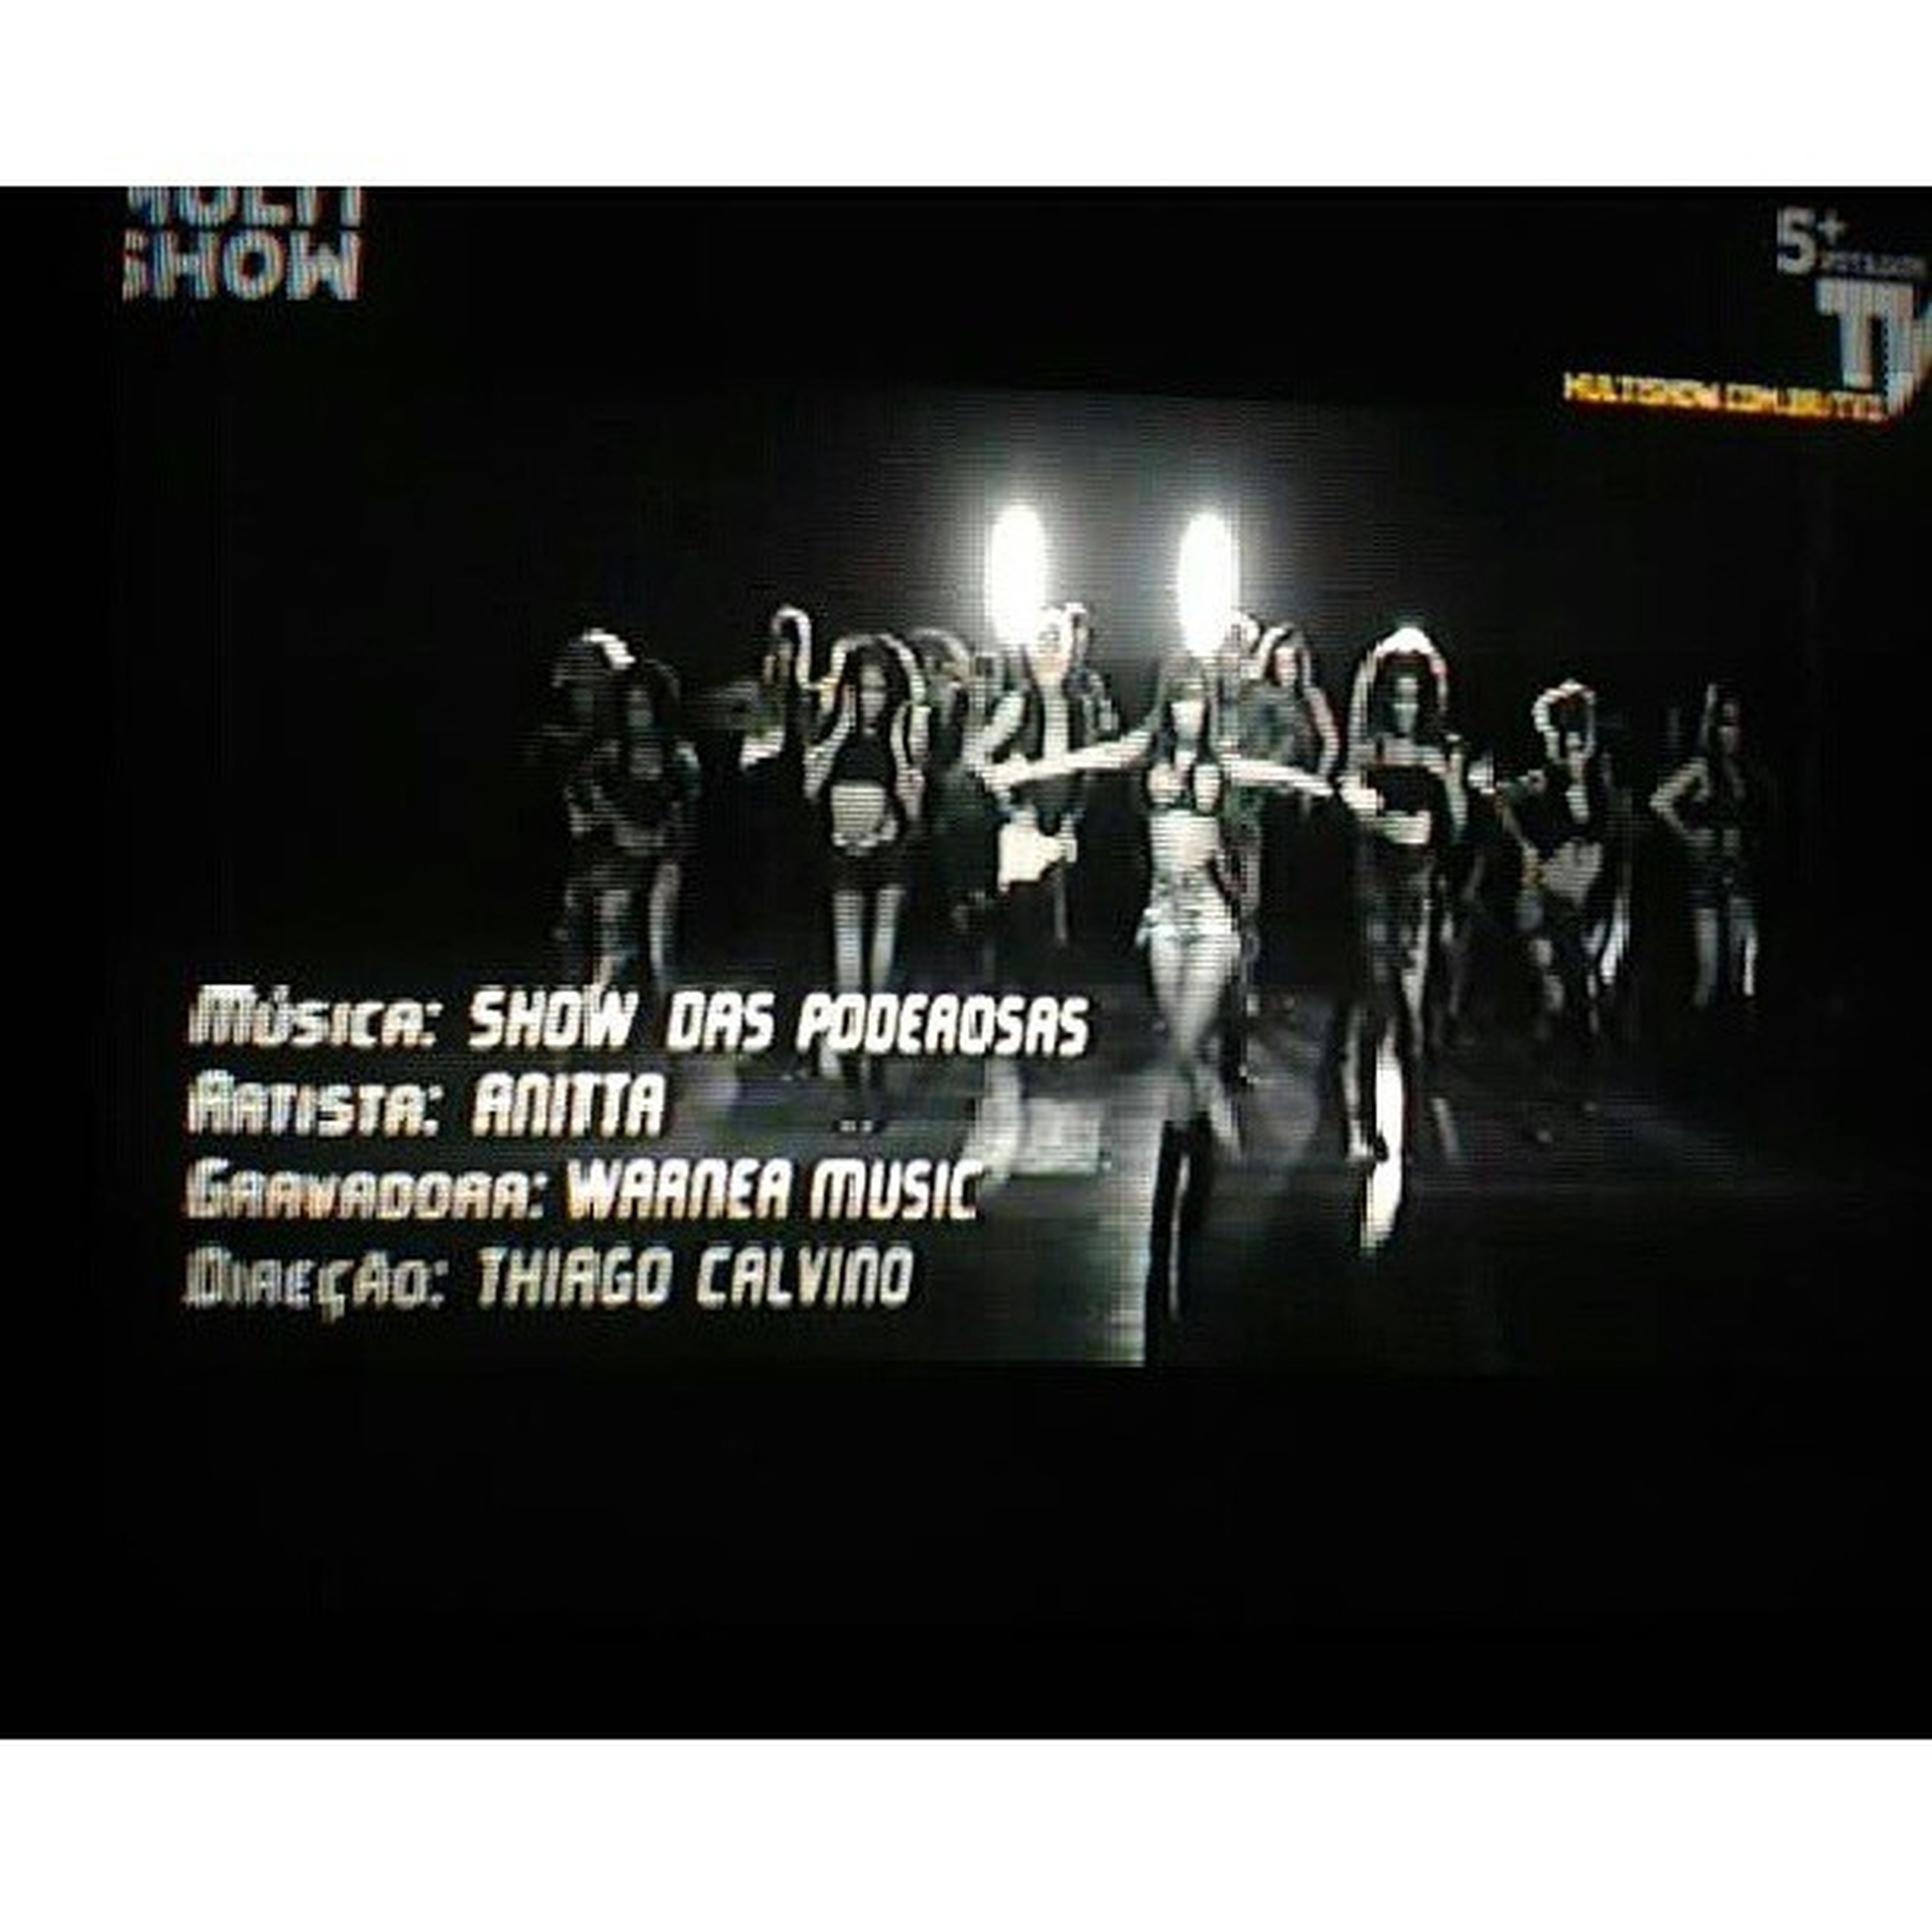 PRE PA RA Mcanitta Showdaspoderosas Prepara TVZ multishow sky